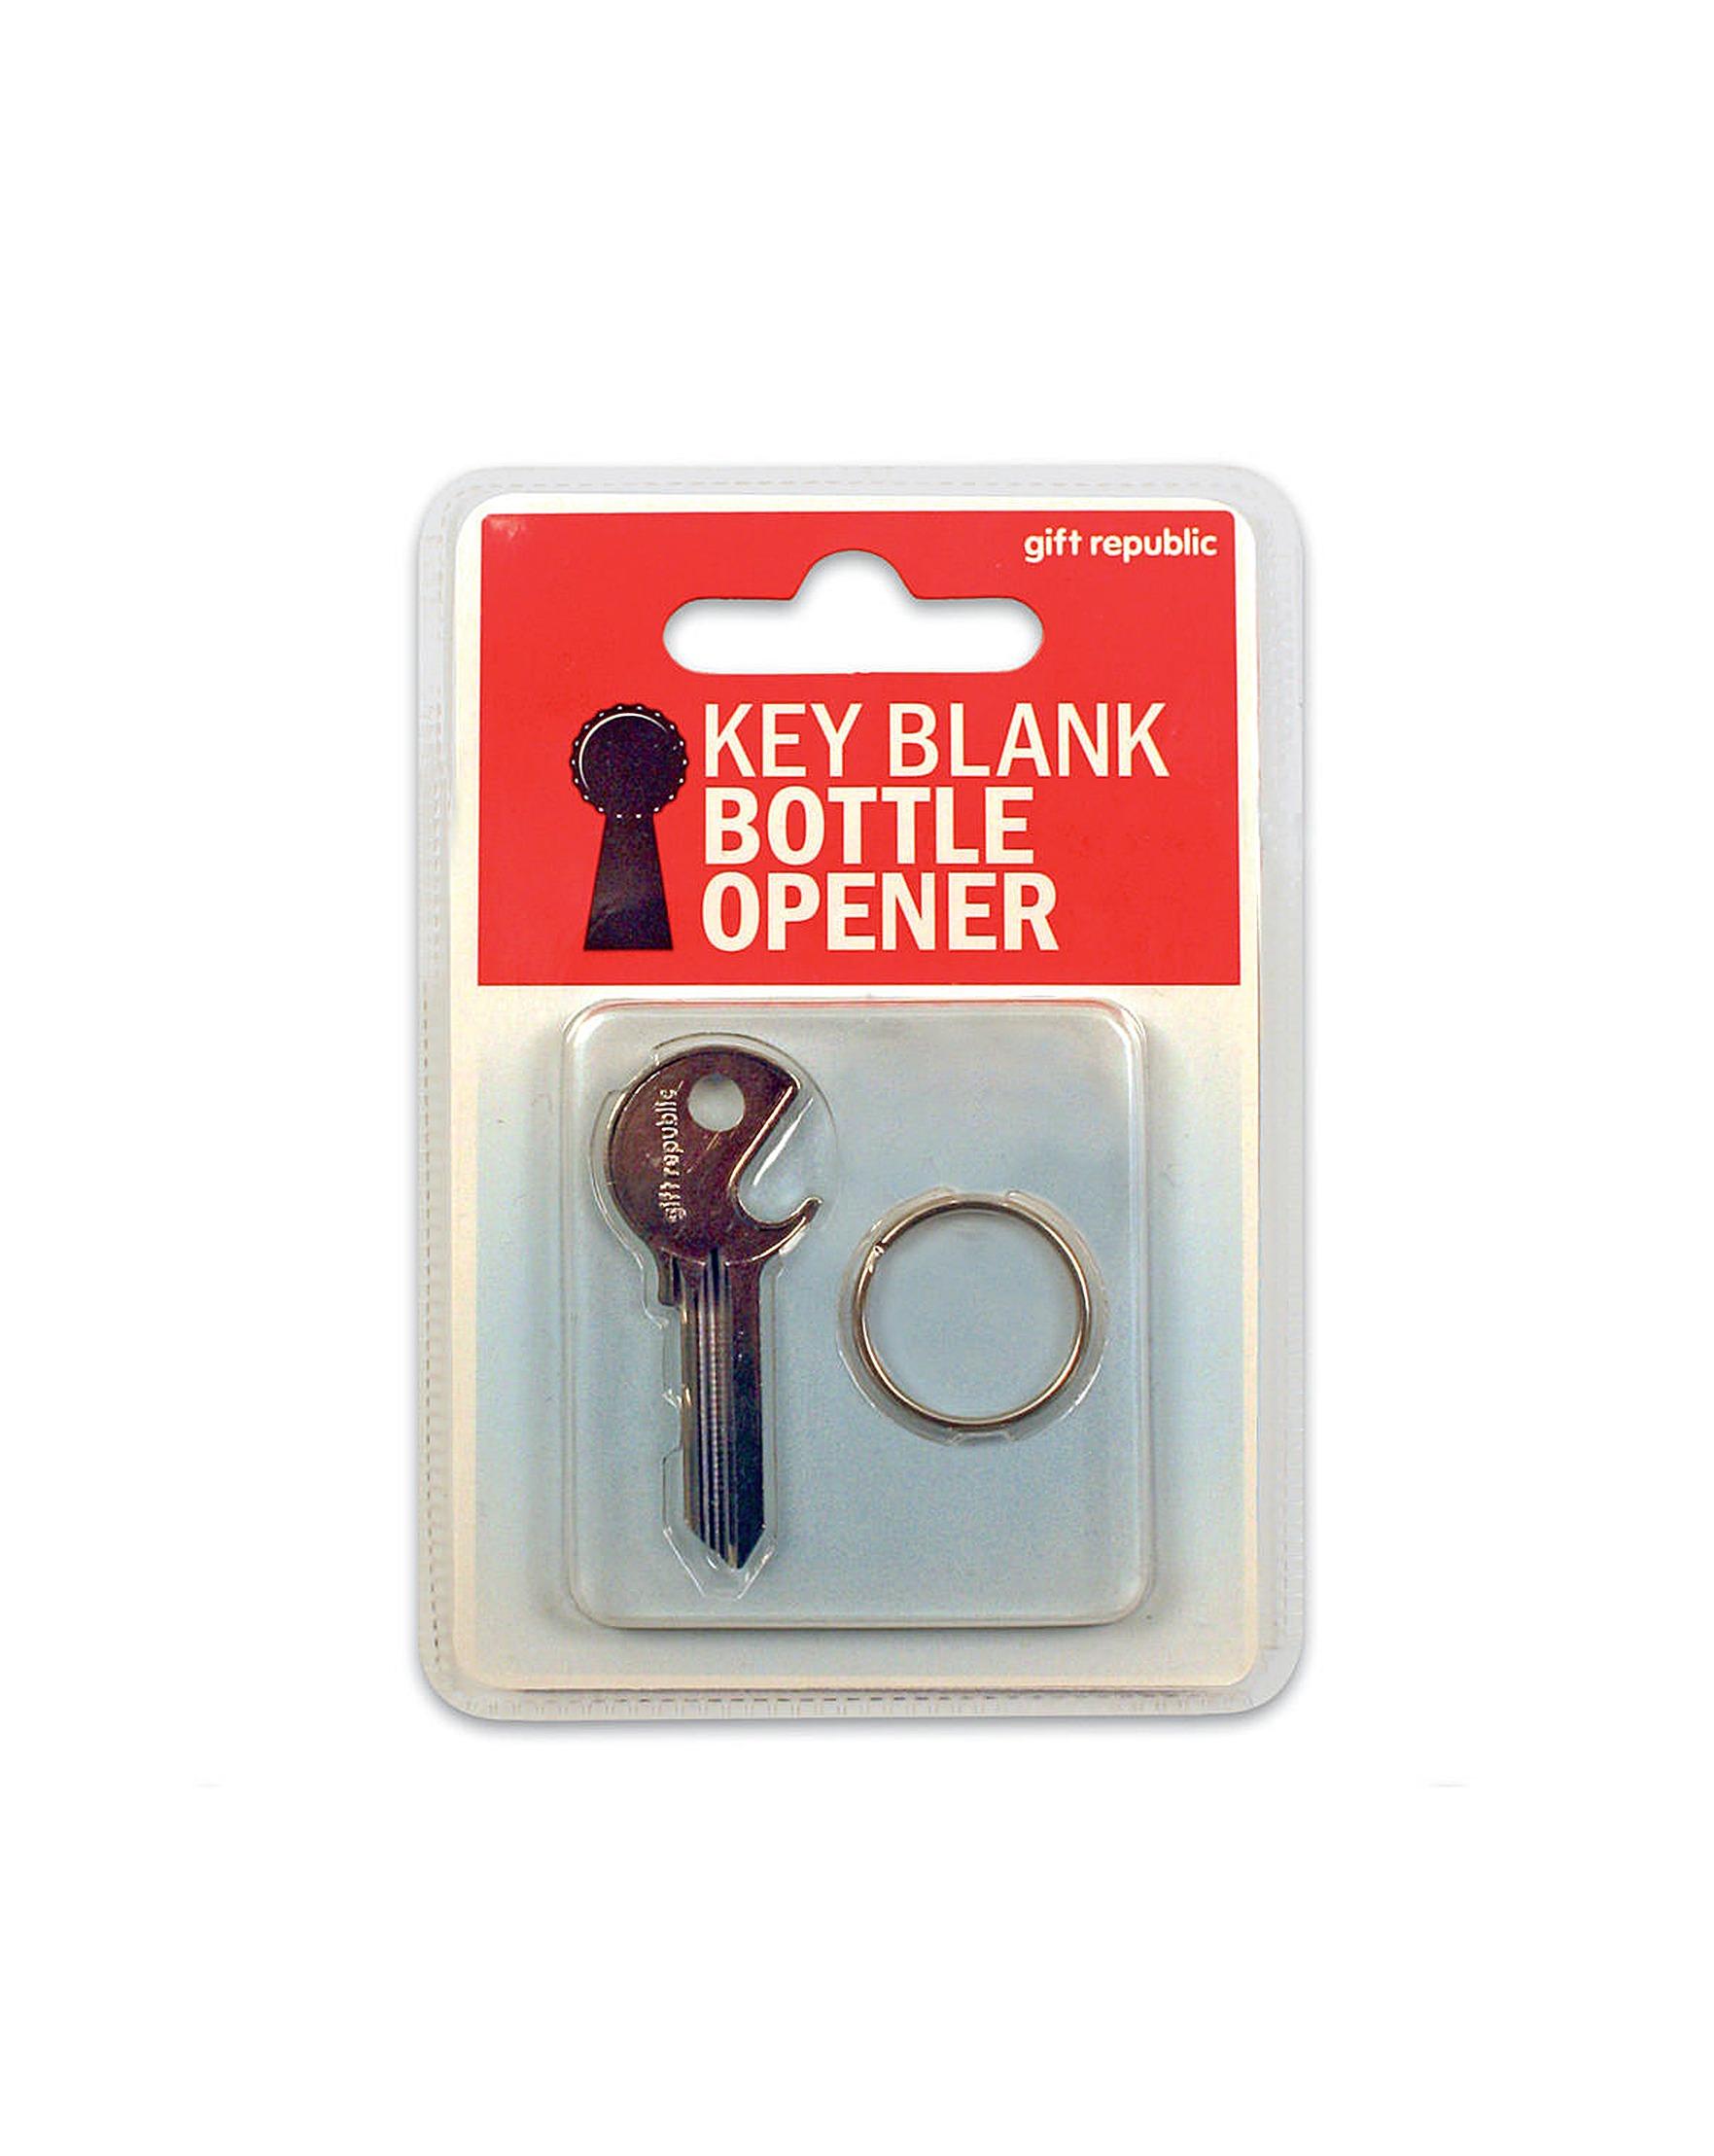 Key Blank Bottle Opener J D Williams Scooter Vip Keychain